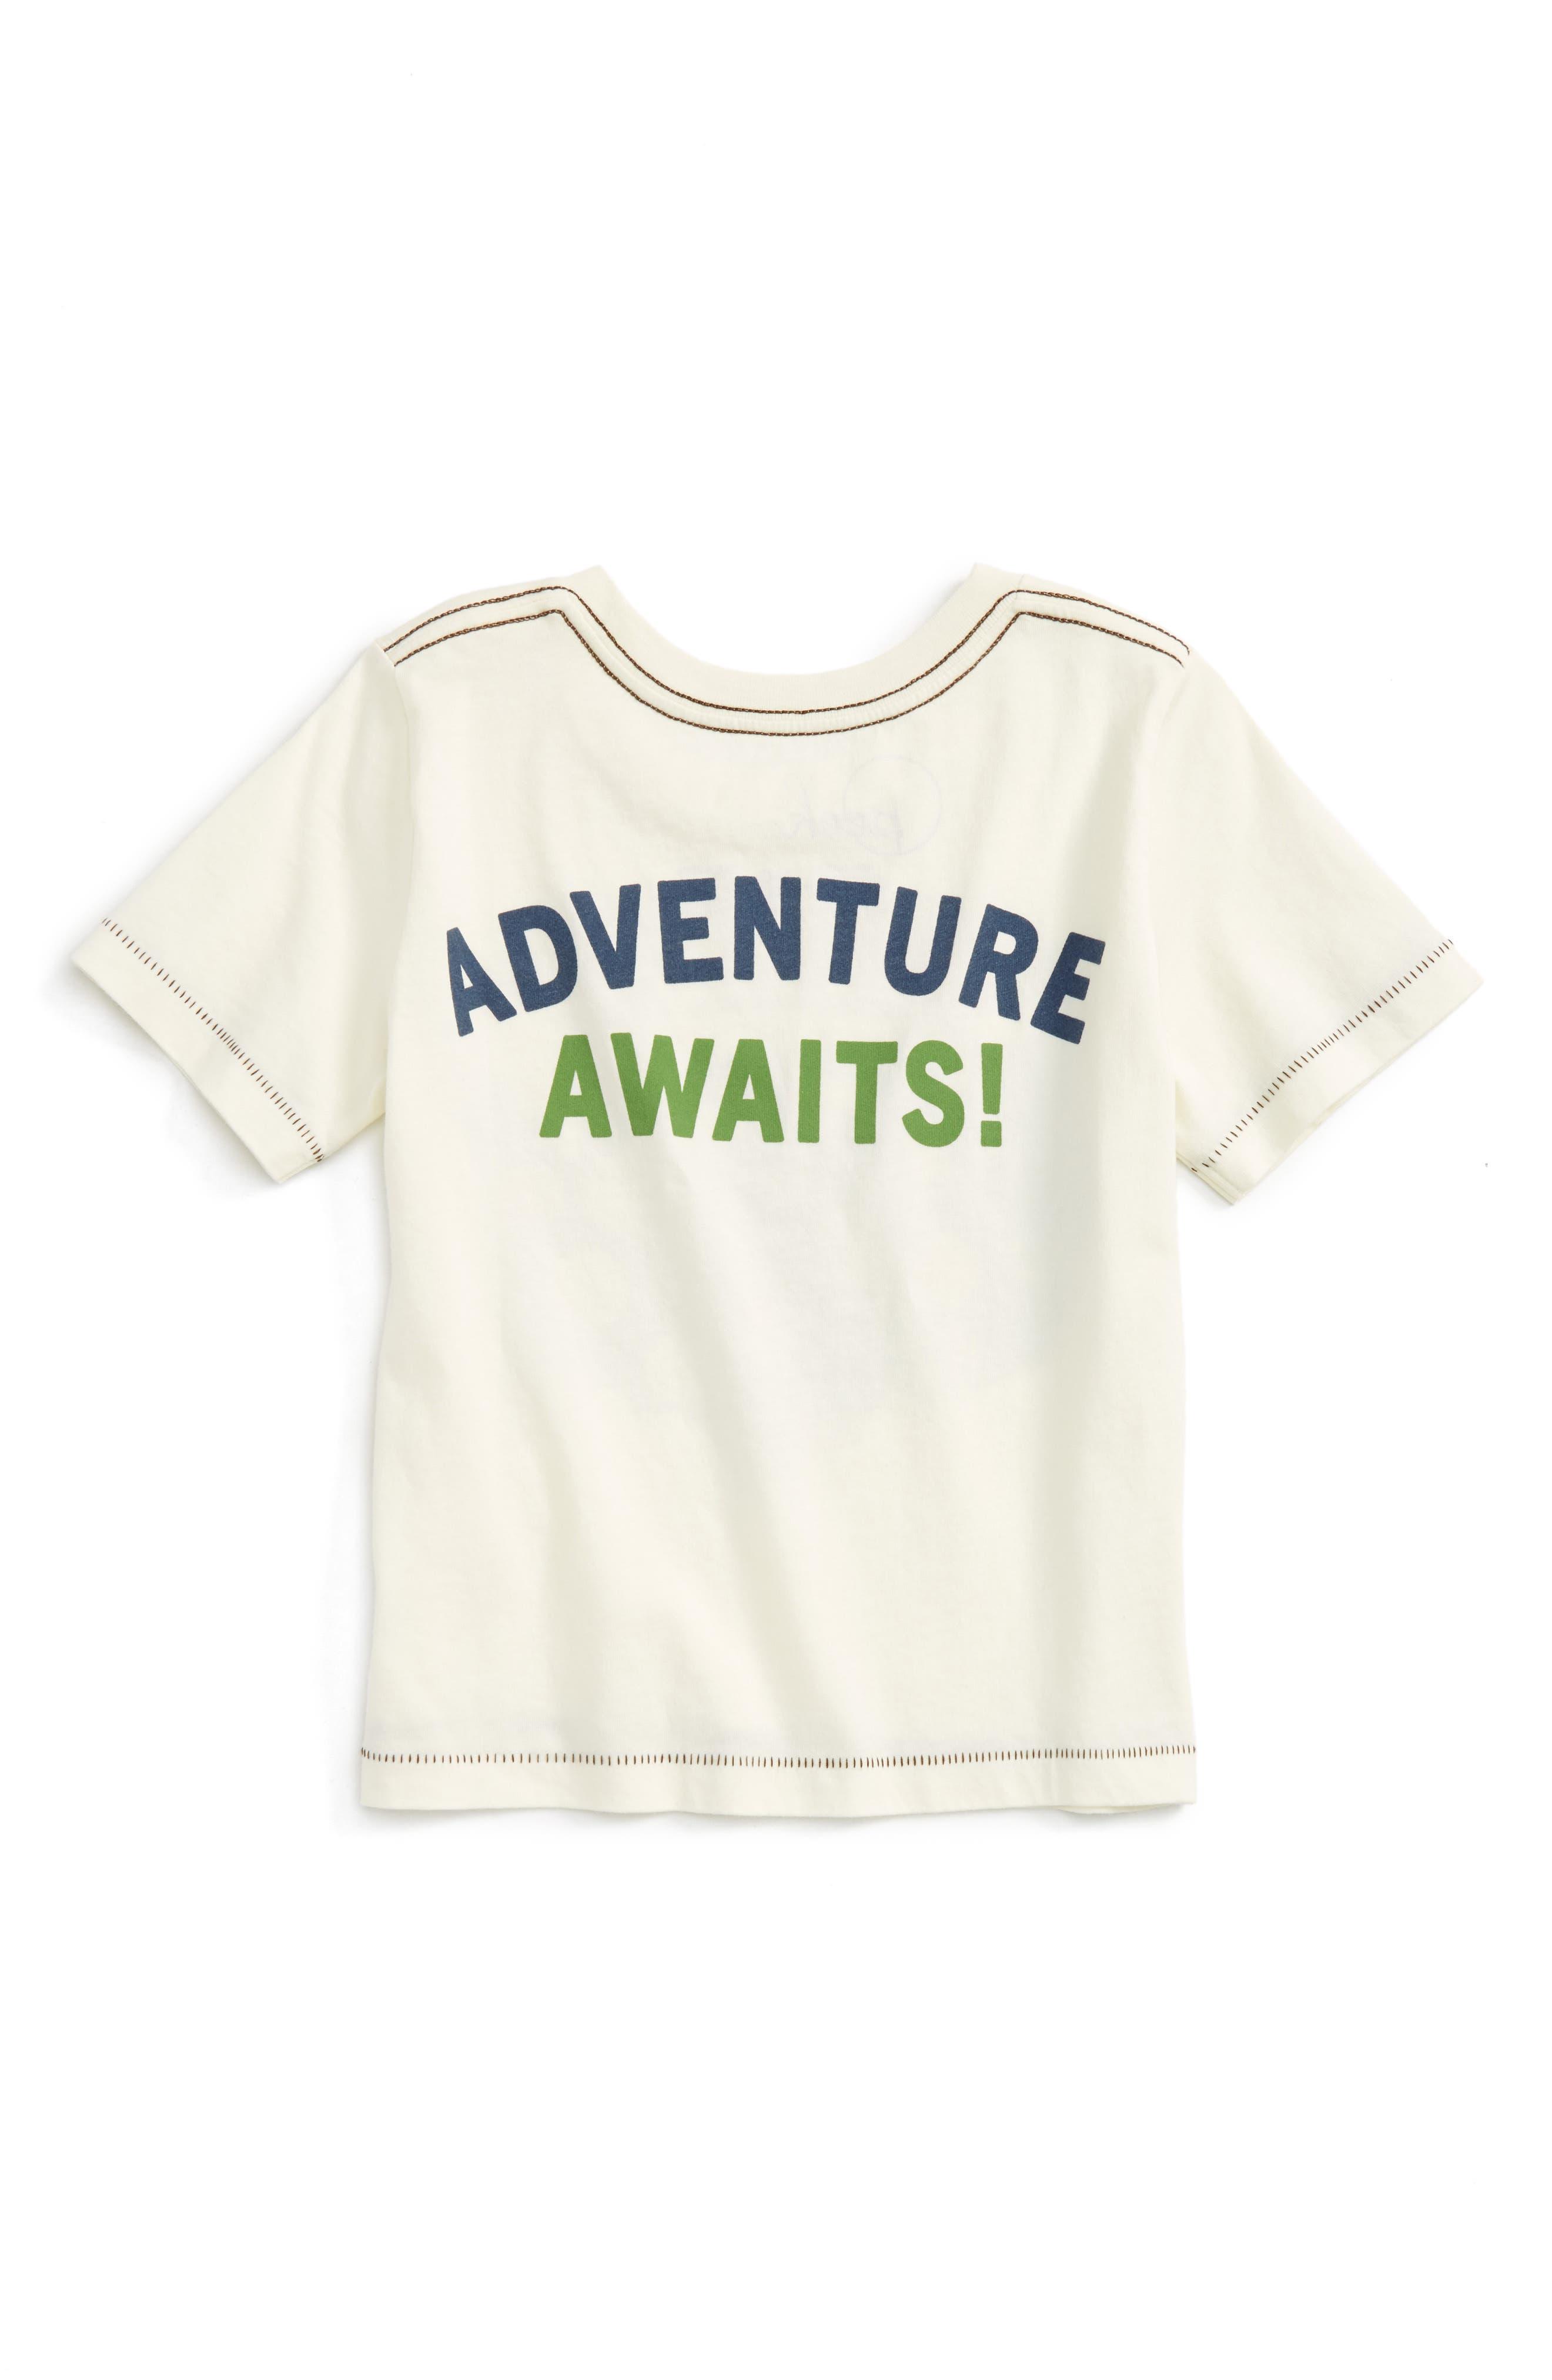 National Parks T-Shirt,                             Alternate thumbnail 2, color,                             900